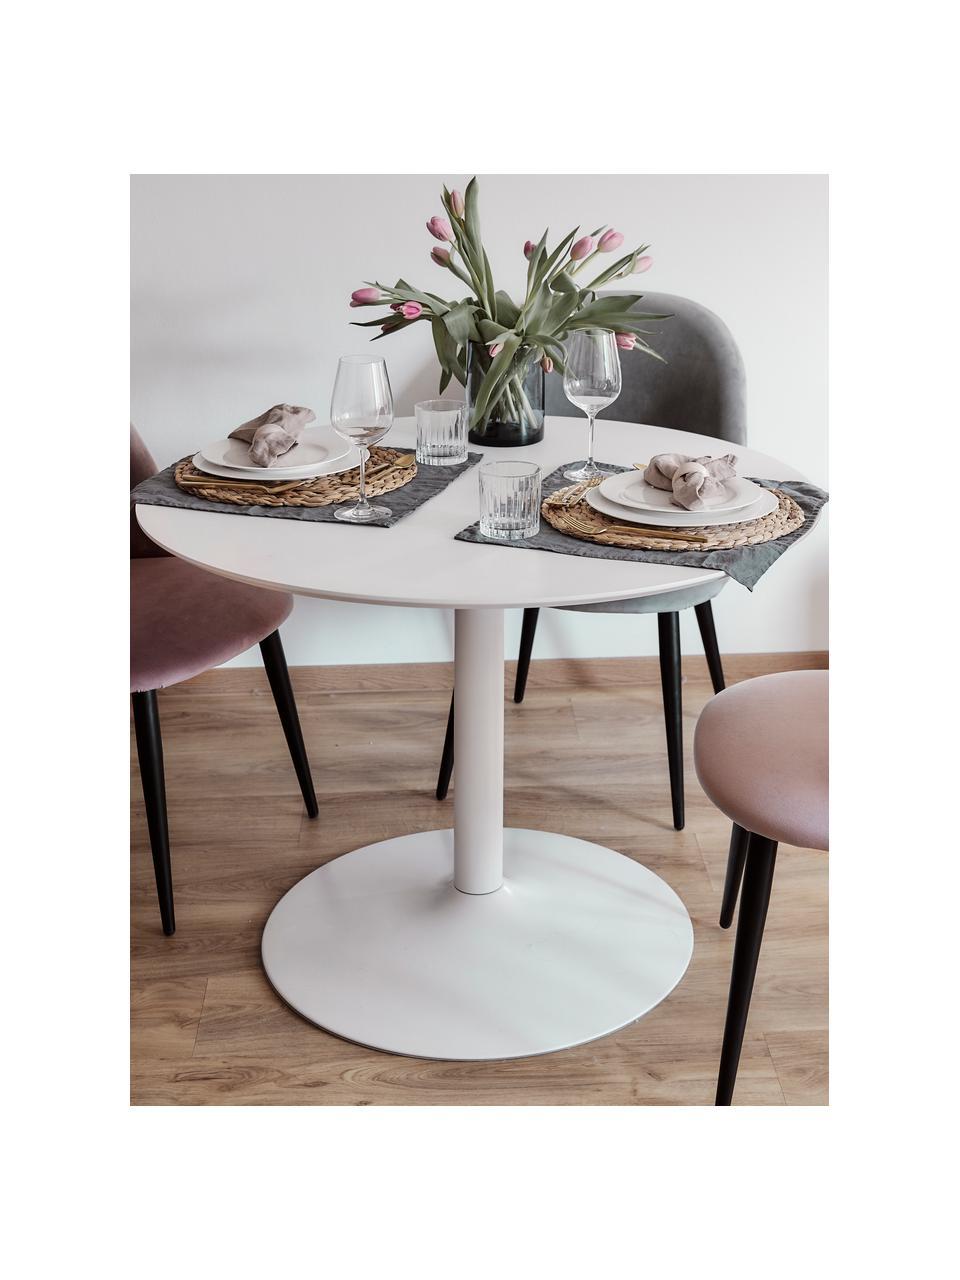 Tavolo rotondo effetto marmo bianco Karla, Bianco con  effetto marmo, Ø 90 x Alt. 75 cm